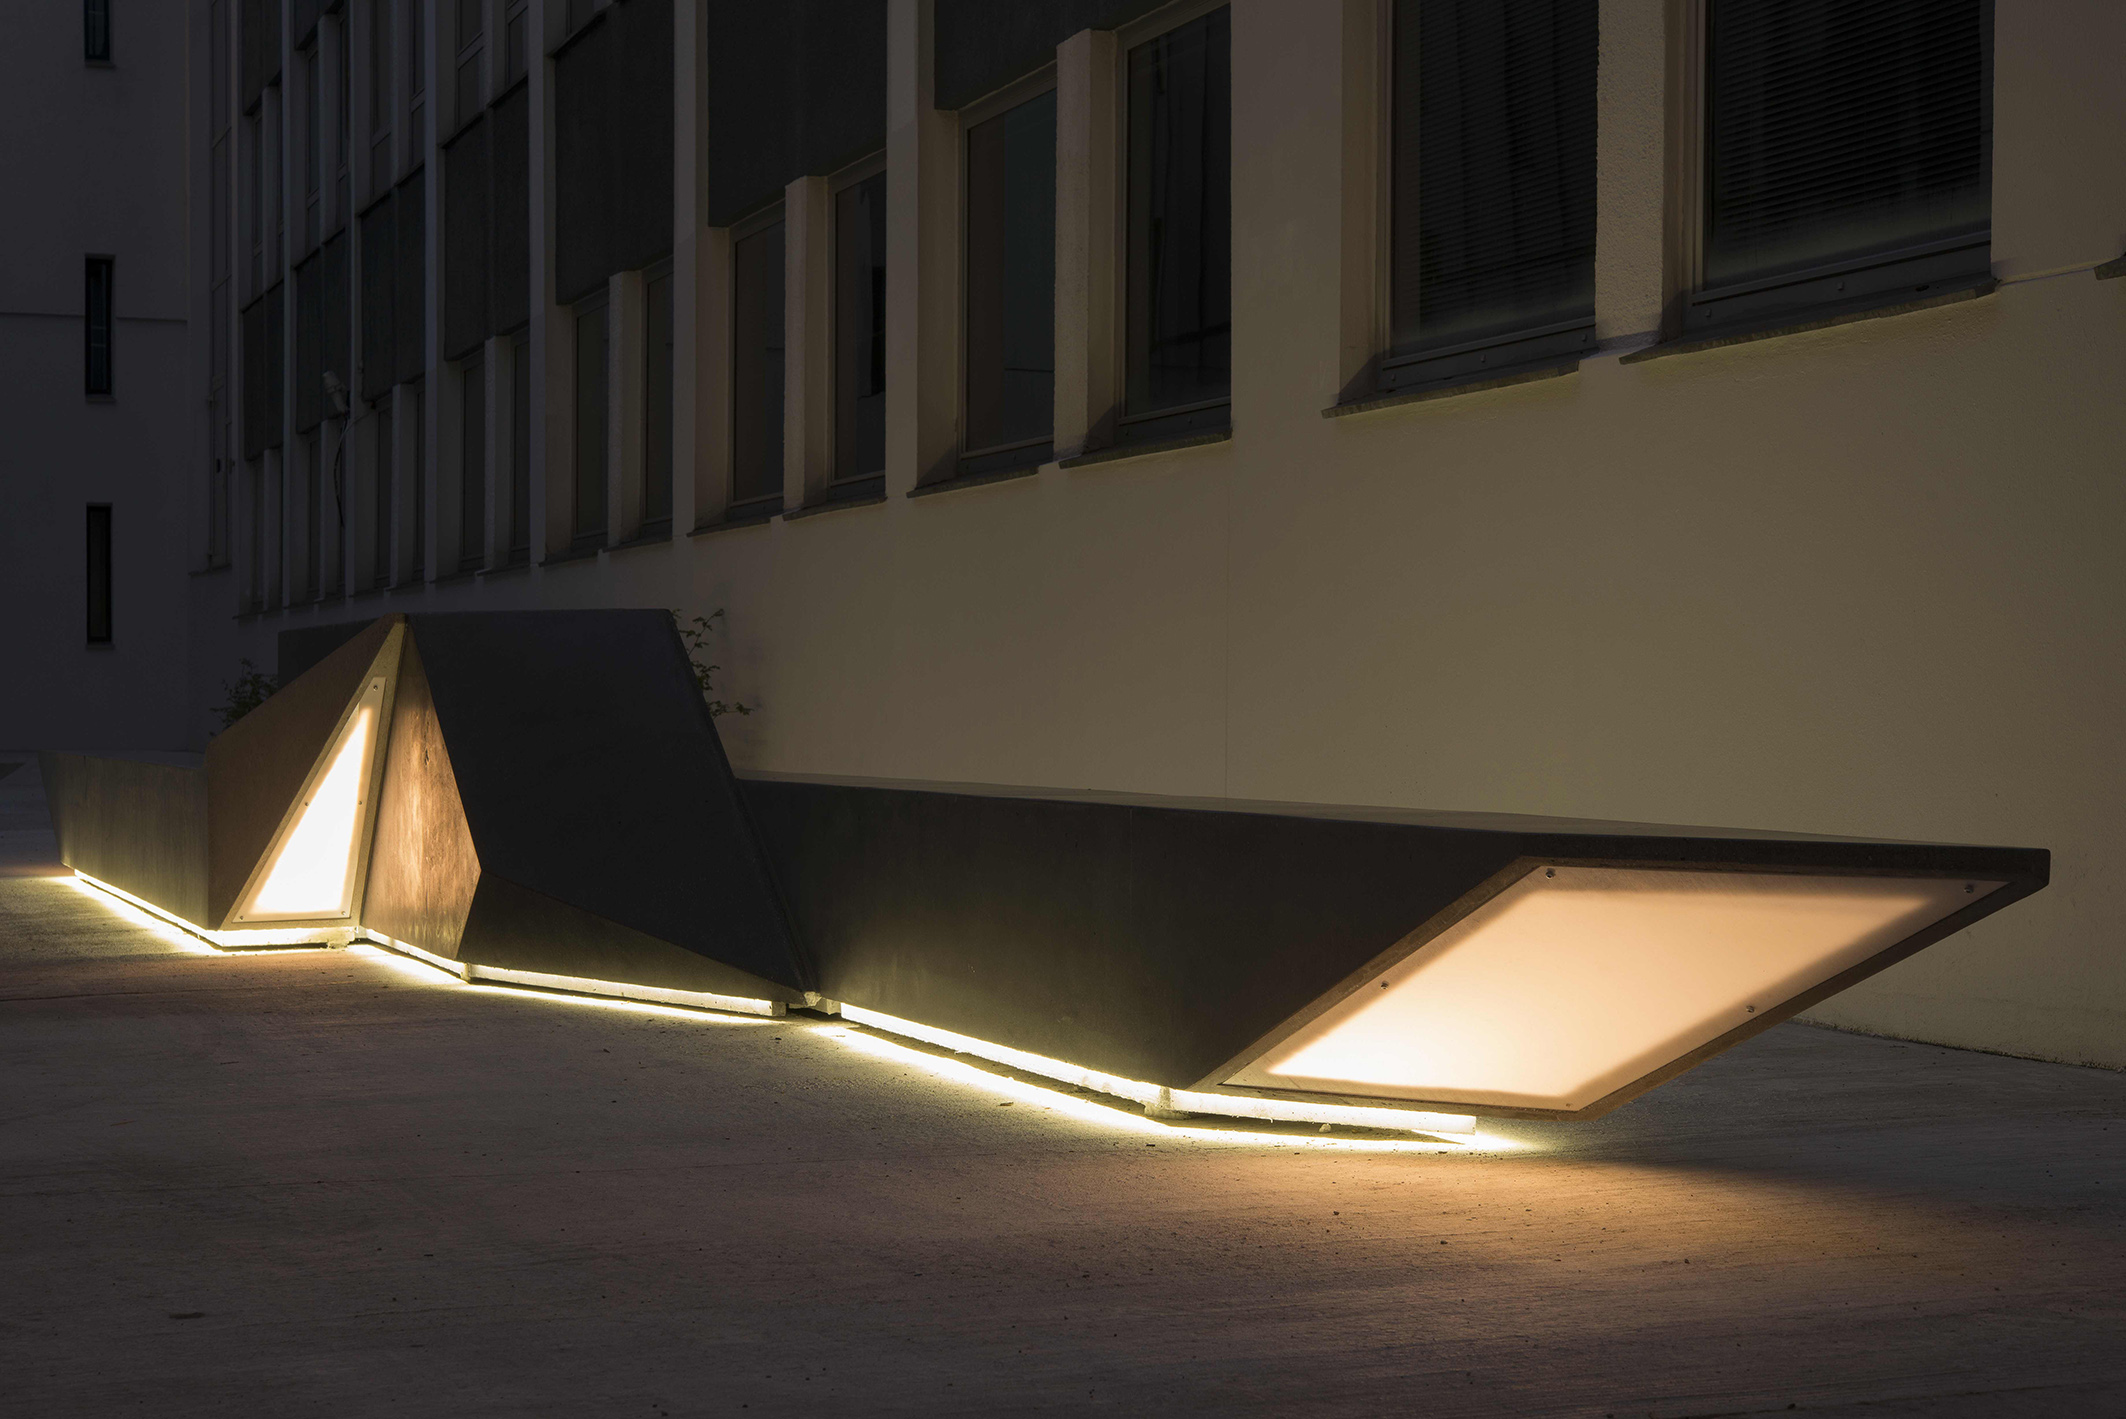 Unfolded Shape Drifter  Concrete sculpture with lights